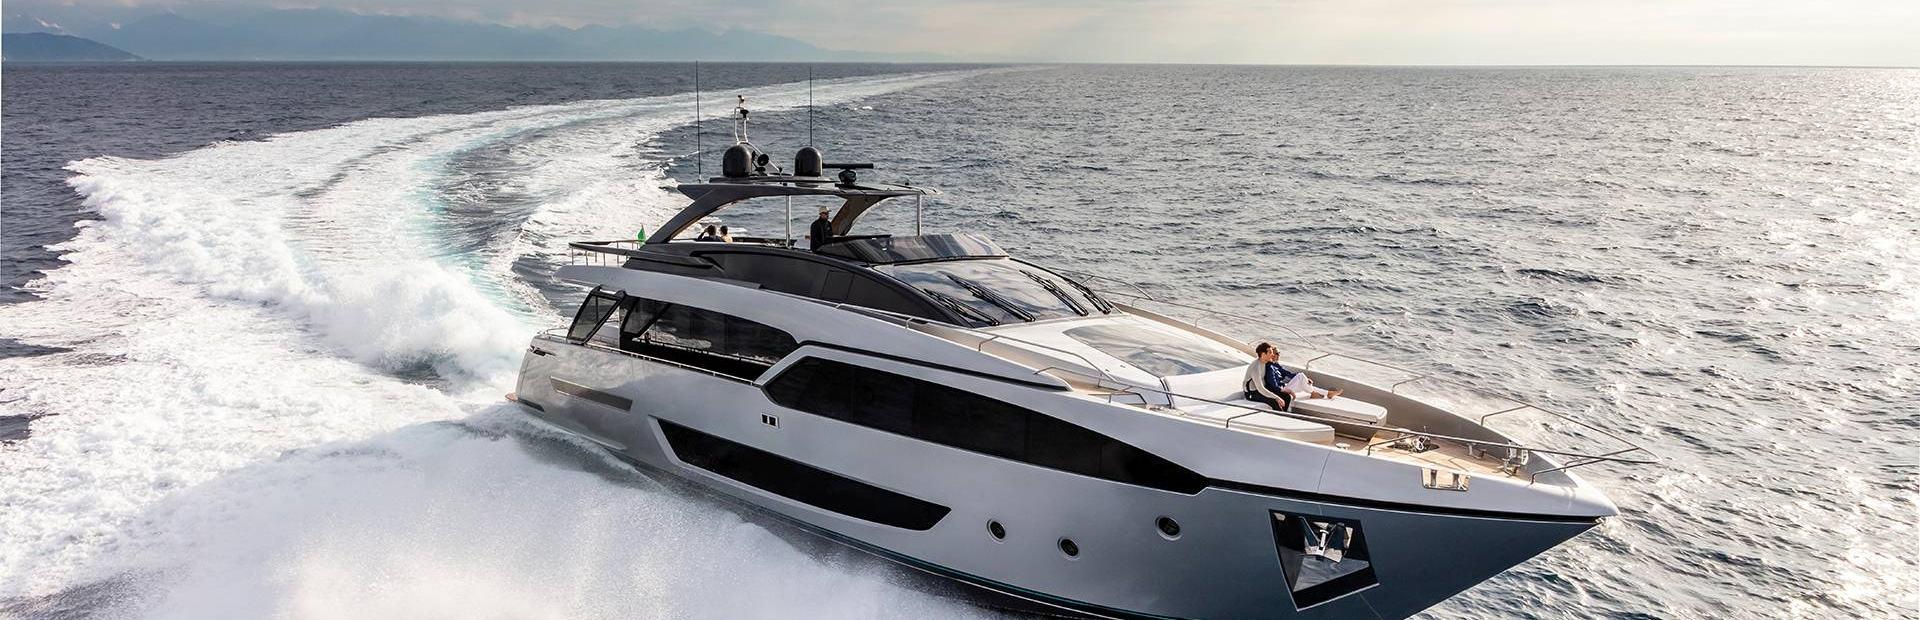 90' Argo Yacht Charter